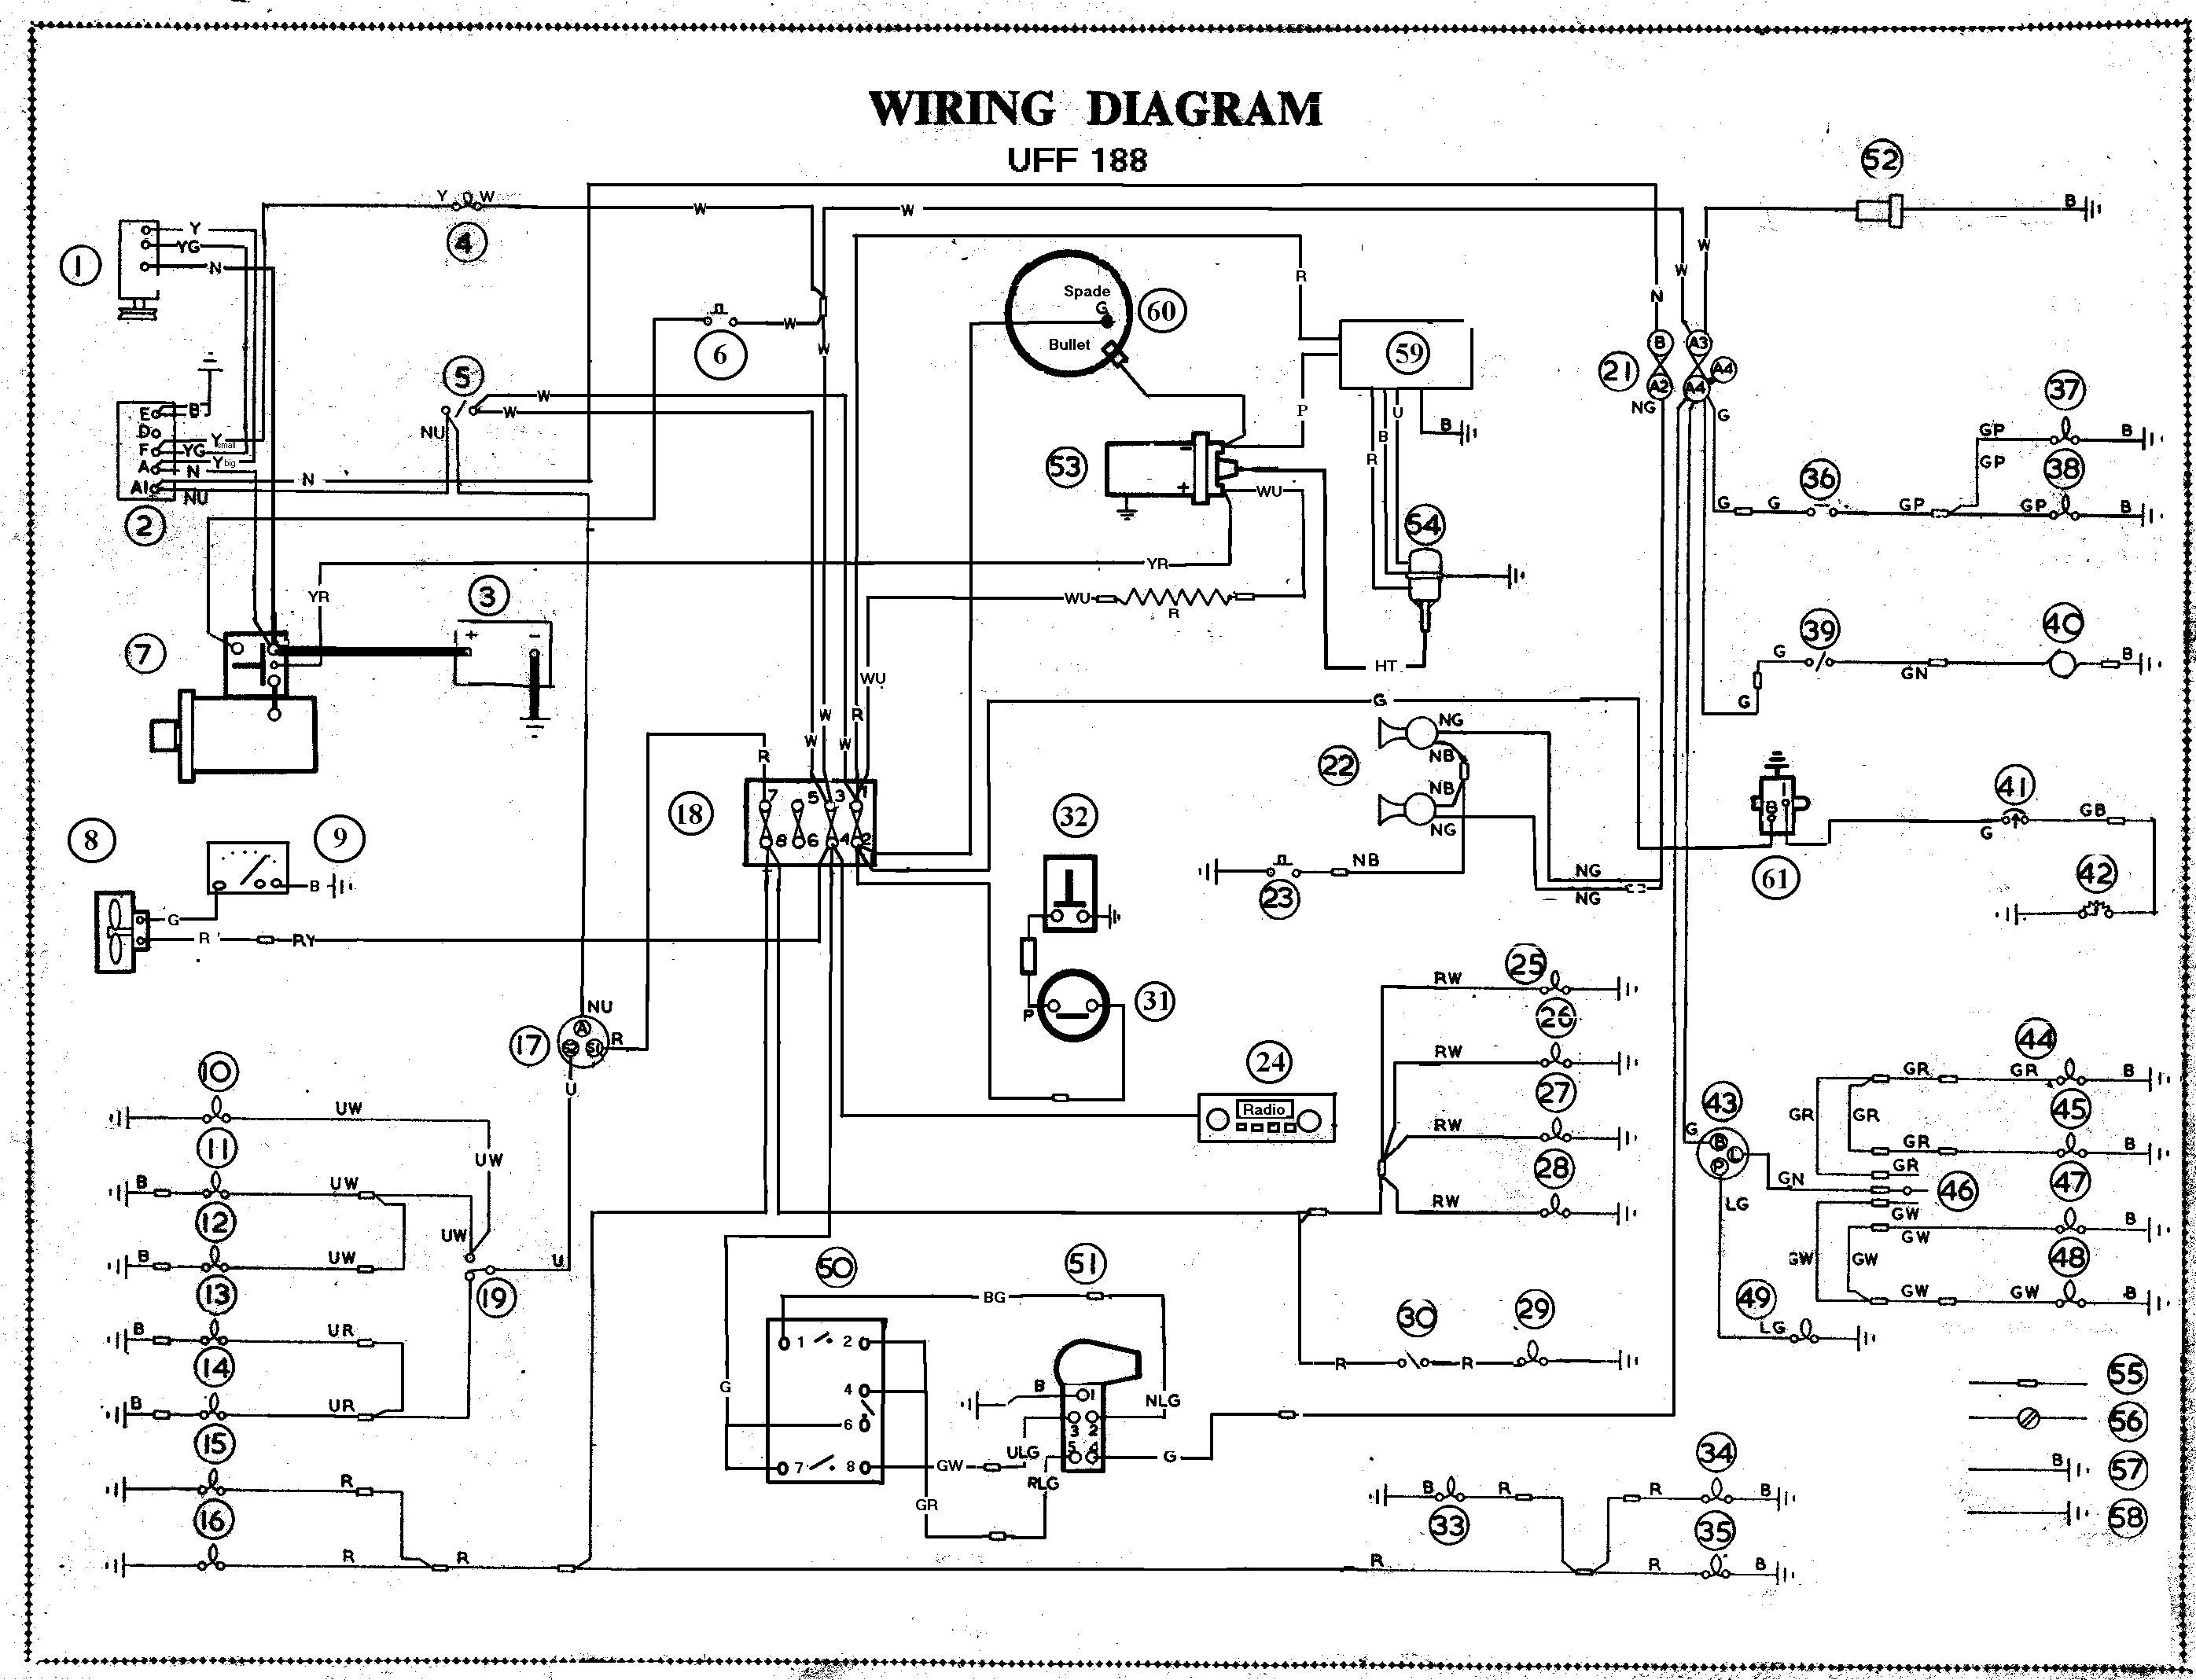 [DIAGRAM] 2002 Gem Wiring Diagram FULL Version HD Quality